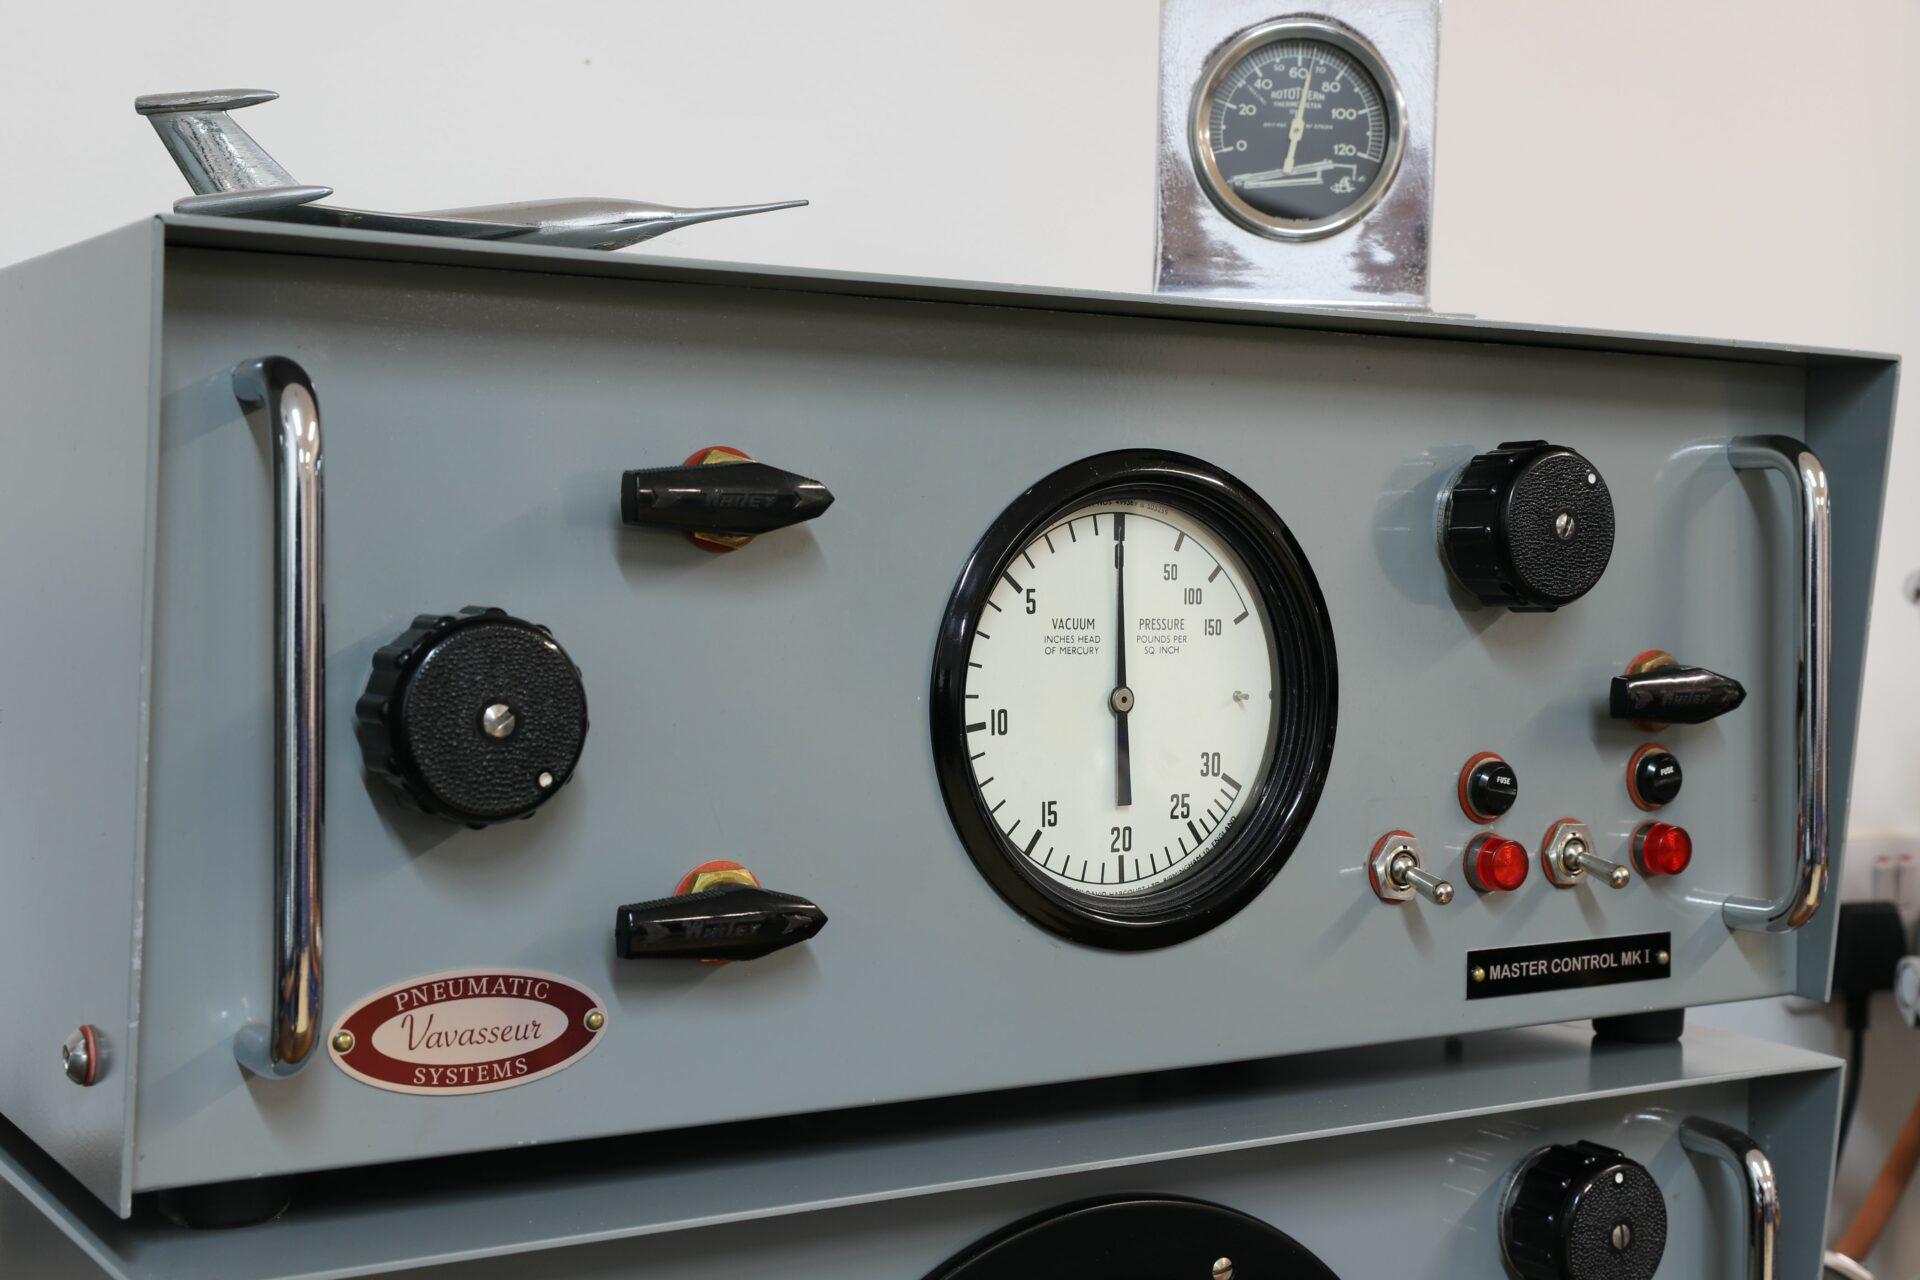 Close up of Vavasseur Laboratory Test Equipment Master Control MK I unit